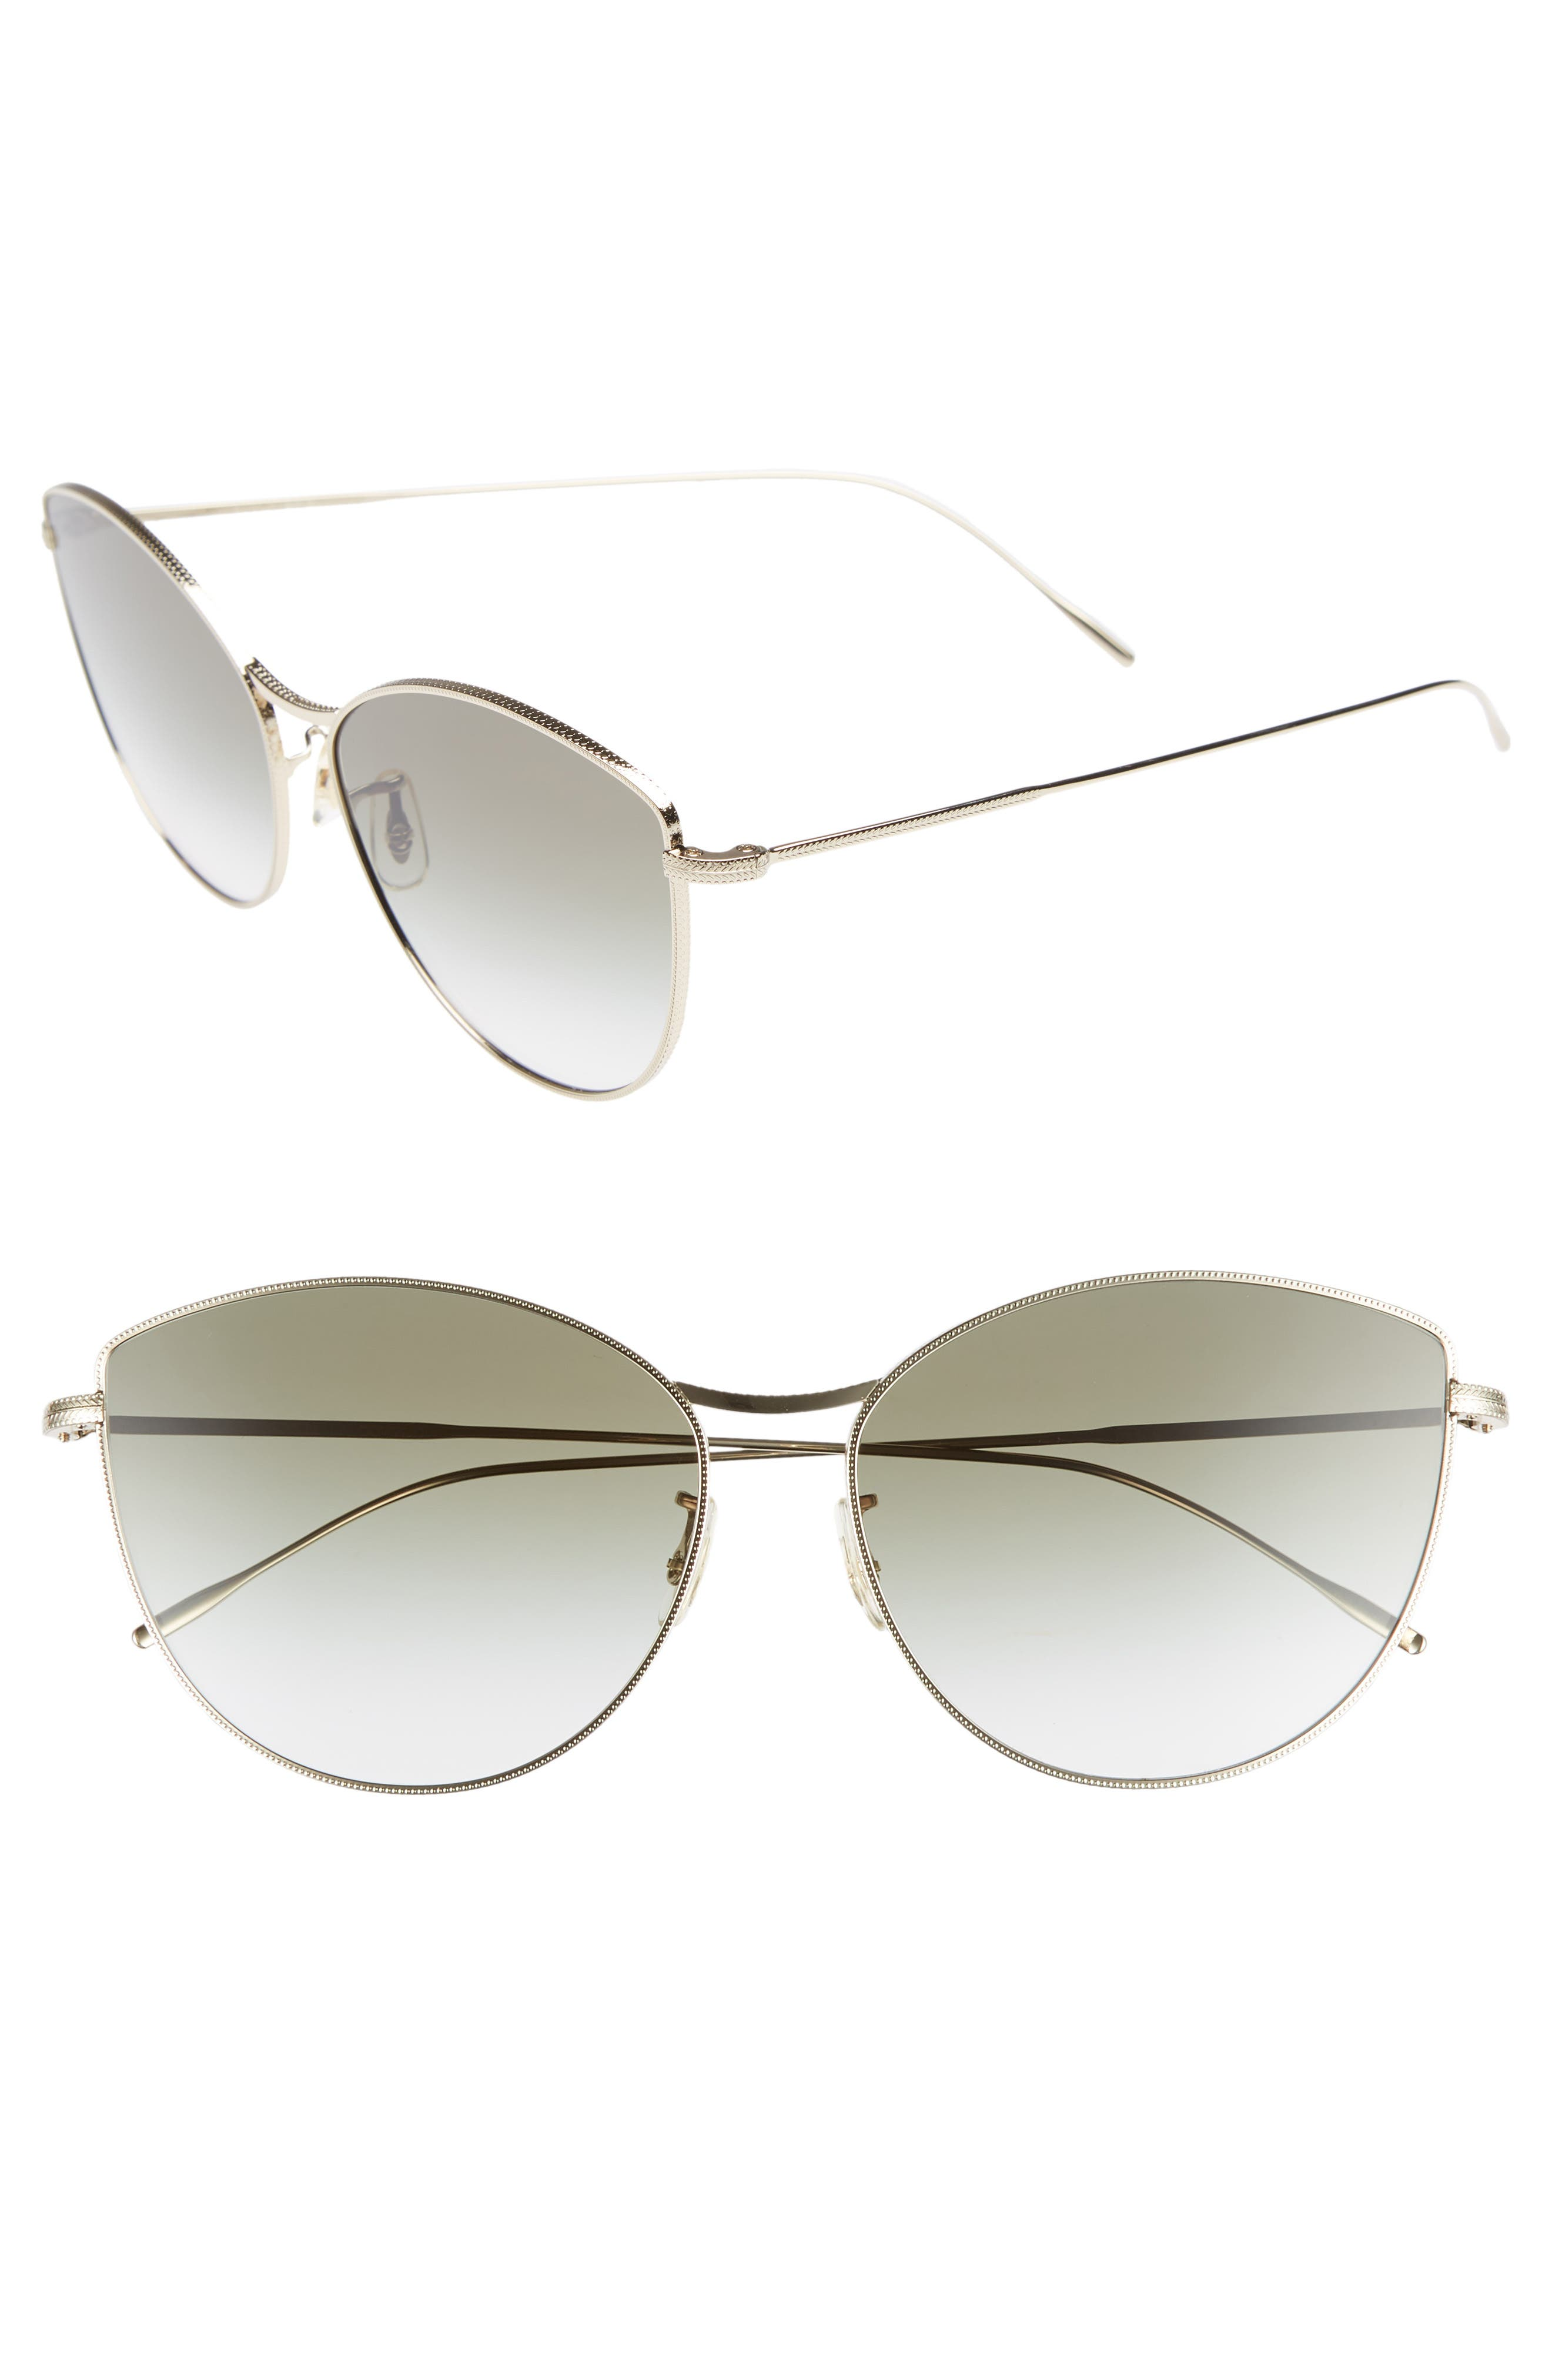 Rayette 60mm Cat Eye Sunglasses,                             Main thumbnail 1, color,                             SOFT GOLD OLIVE